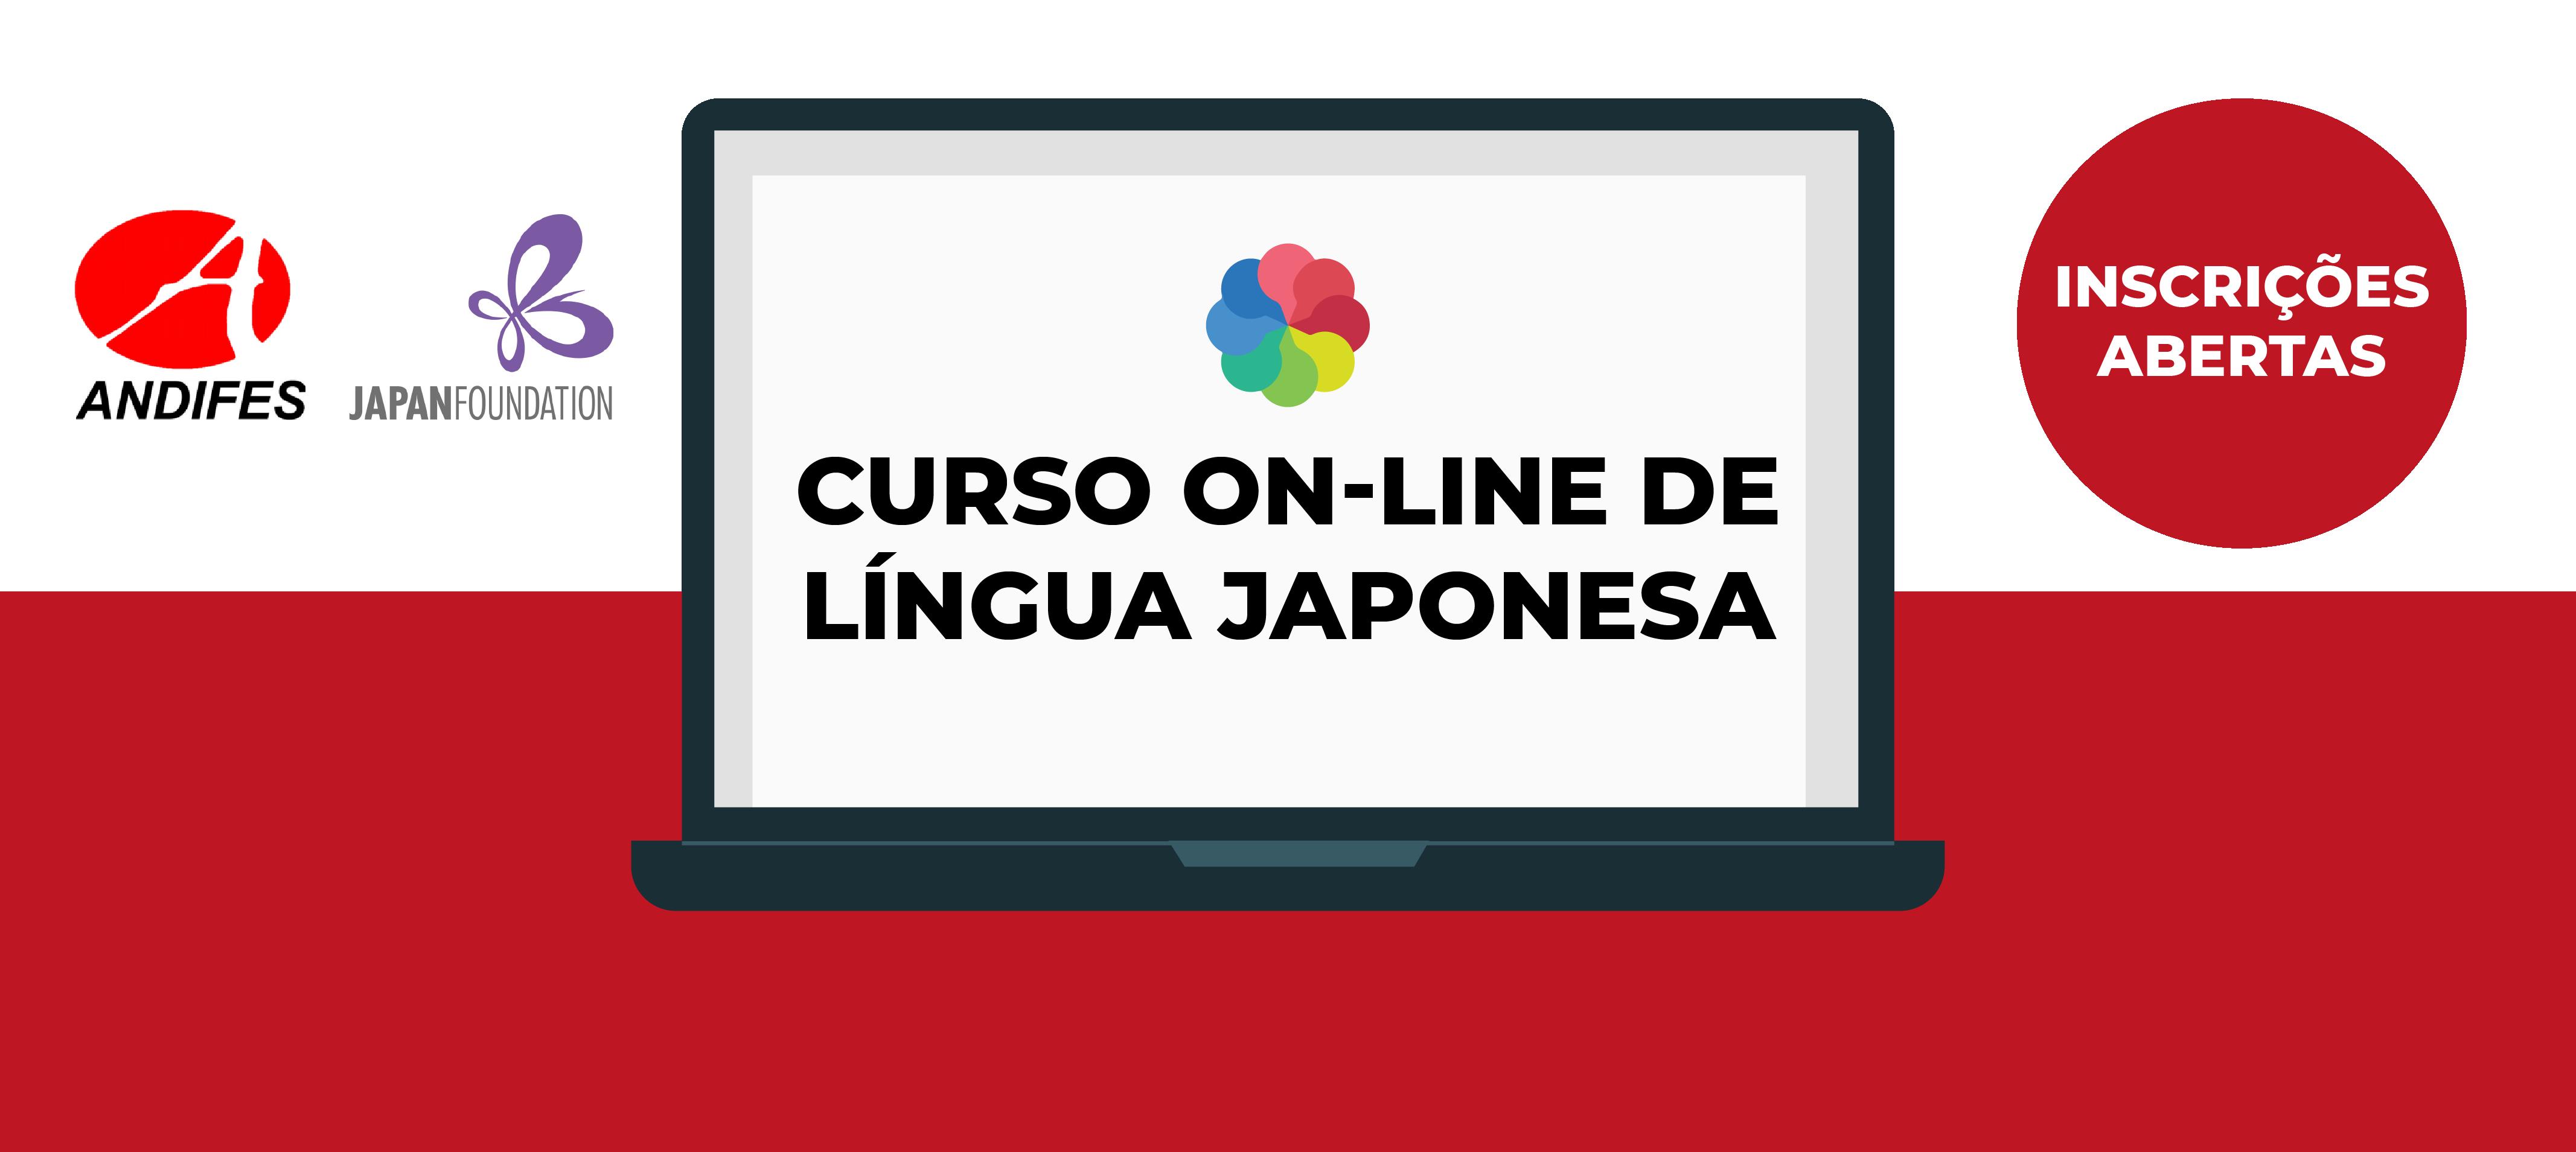 Andifes oferta curso on-line de língua japonesa. Inscrições de 20 a 30 de setembro